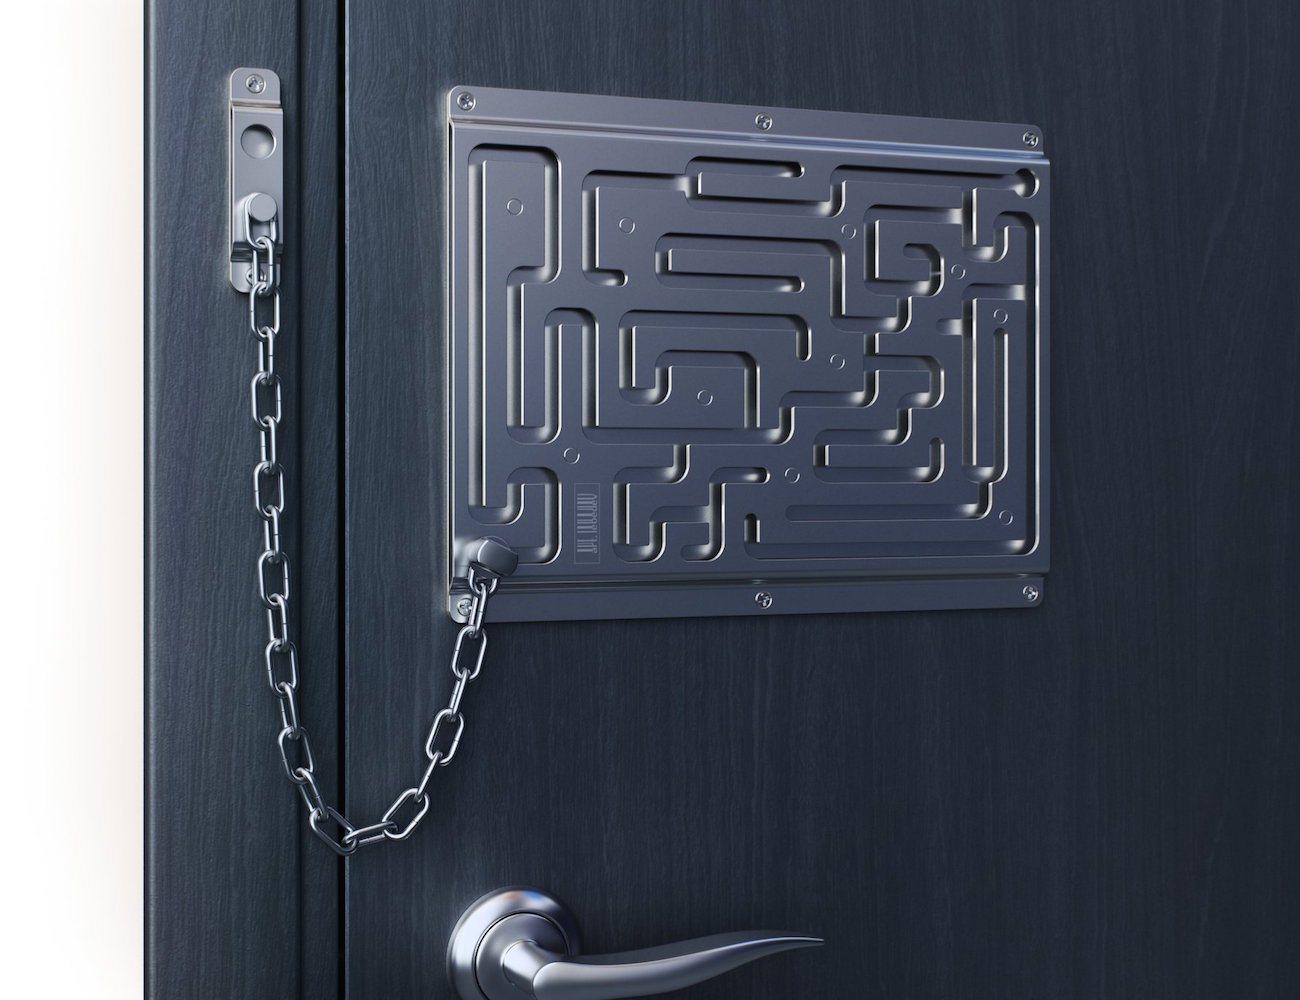 defendius labyrinth security lock review. Black Bedroom Furniture Sets. Home Design Ideas